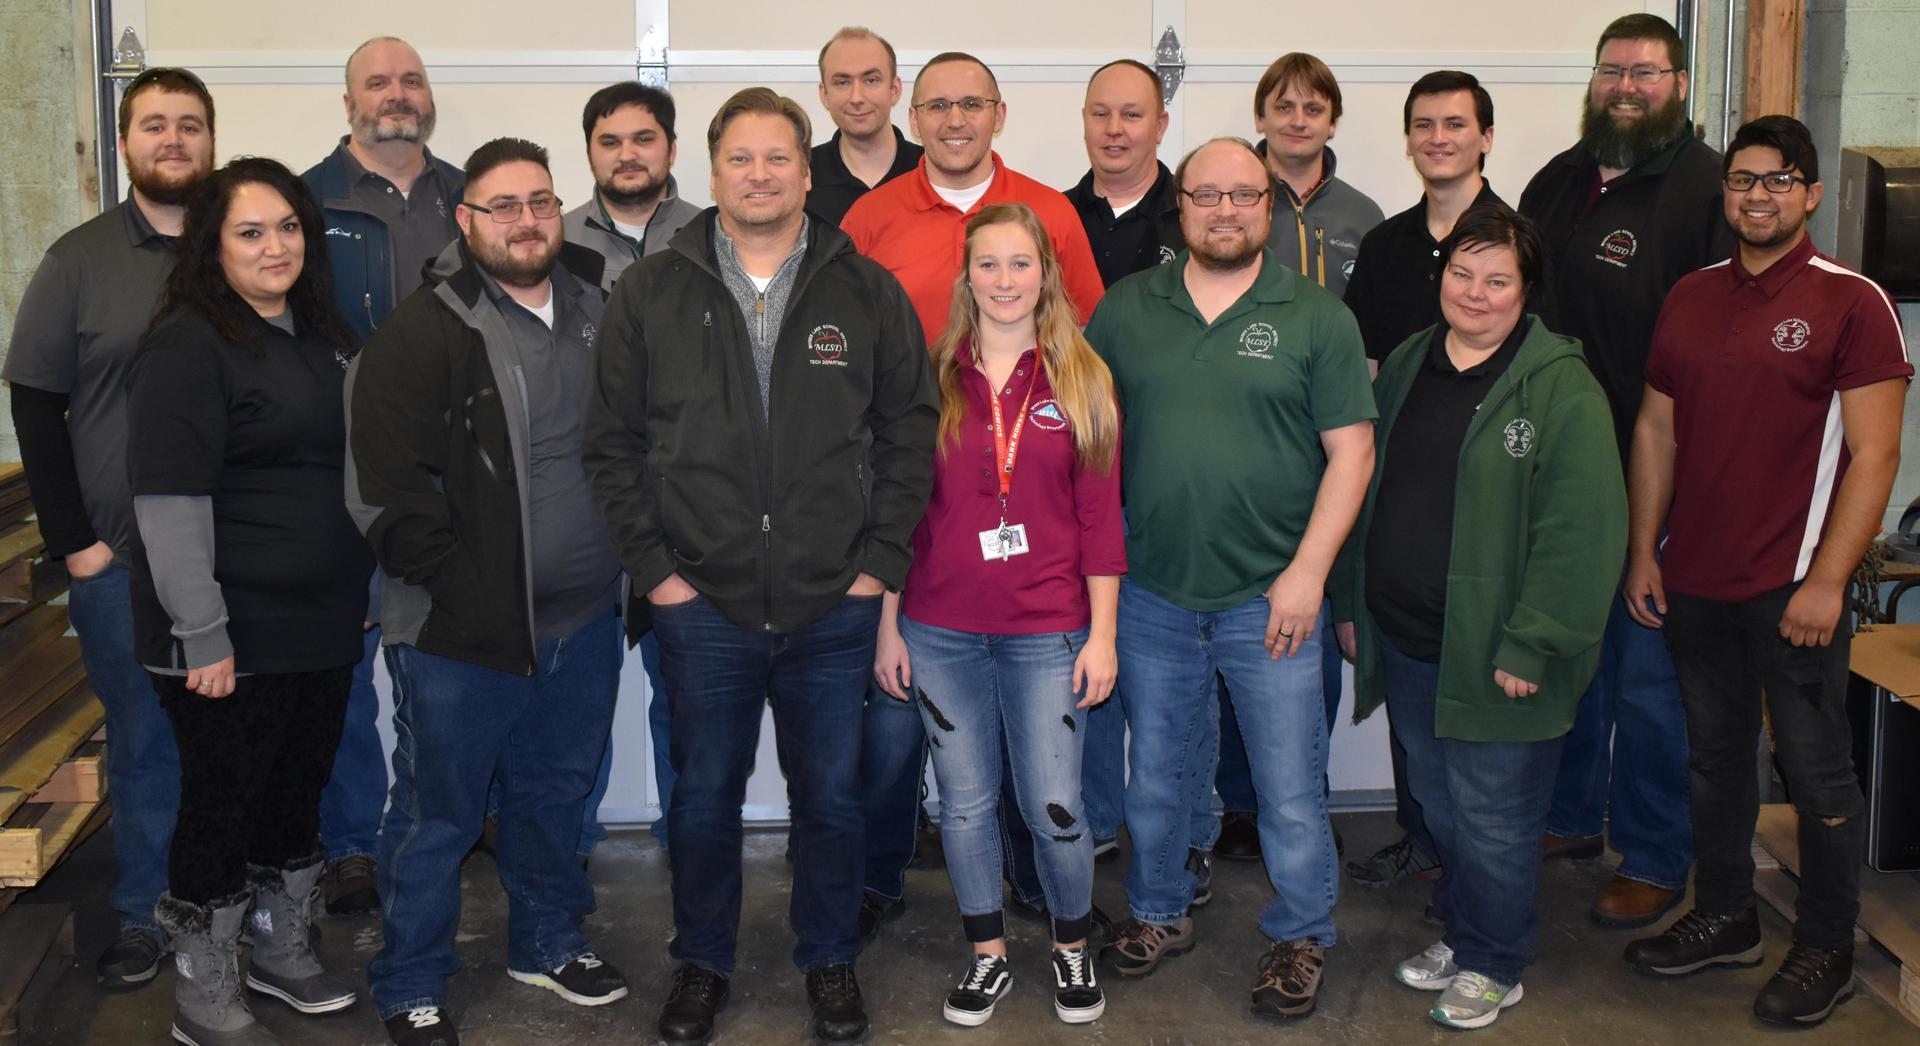 MLSD Tech Staff photo (Names listed below)